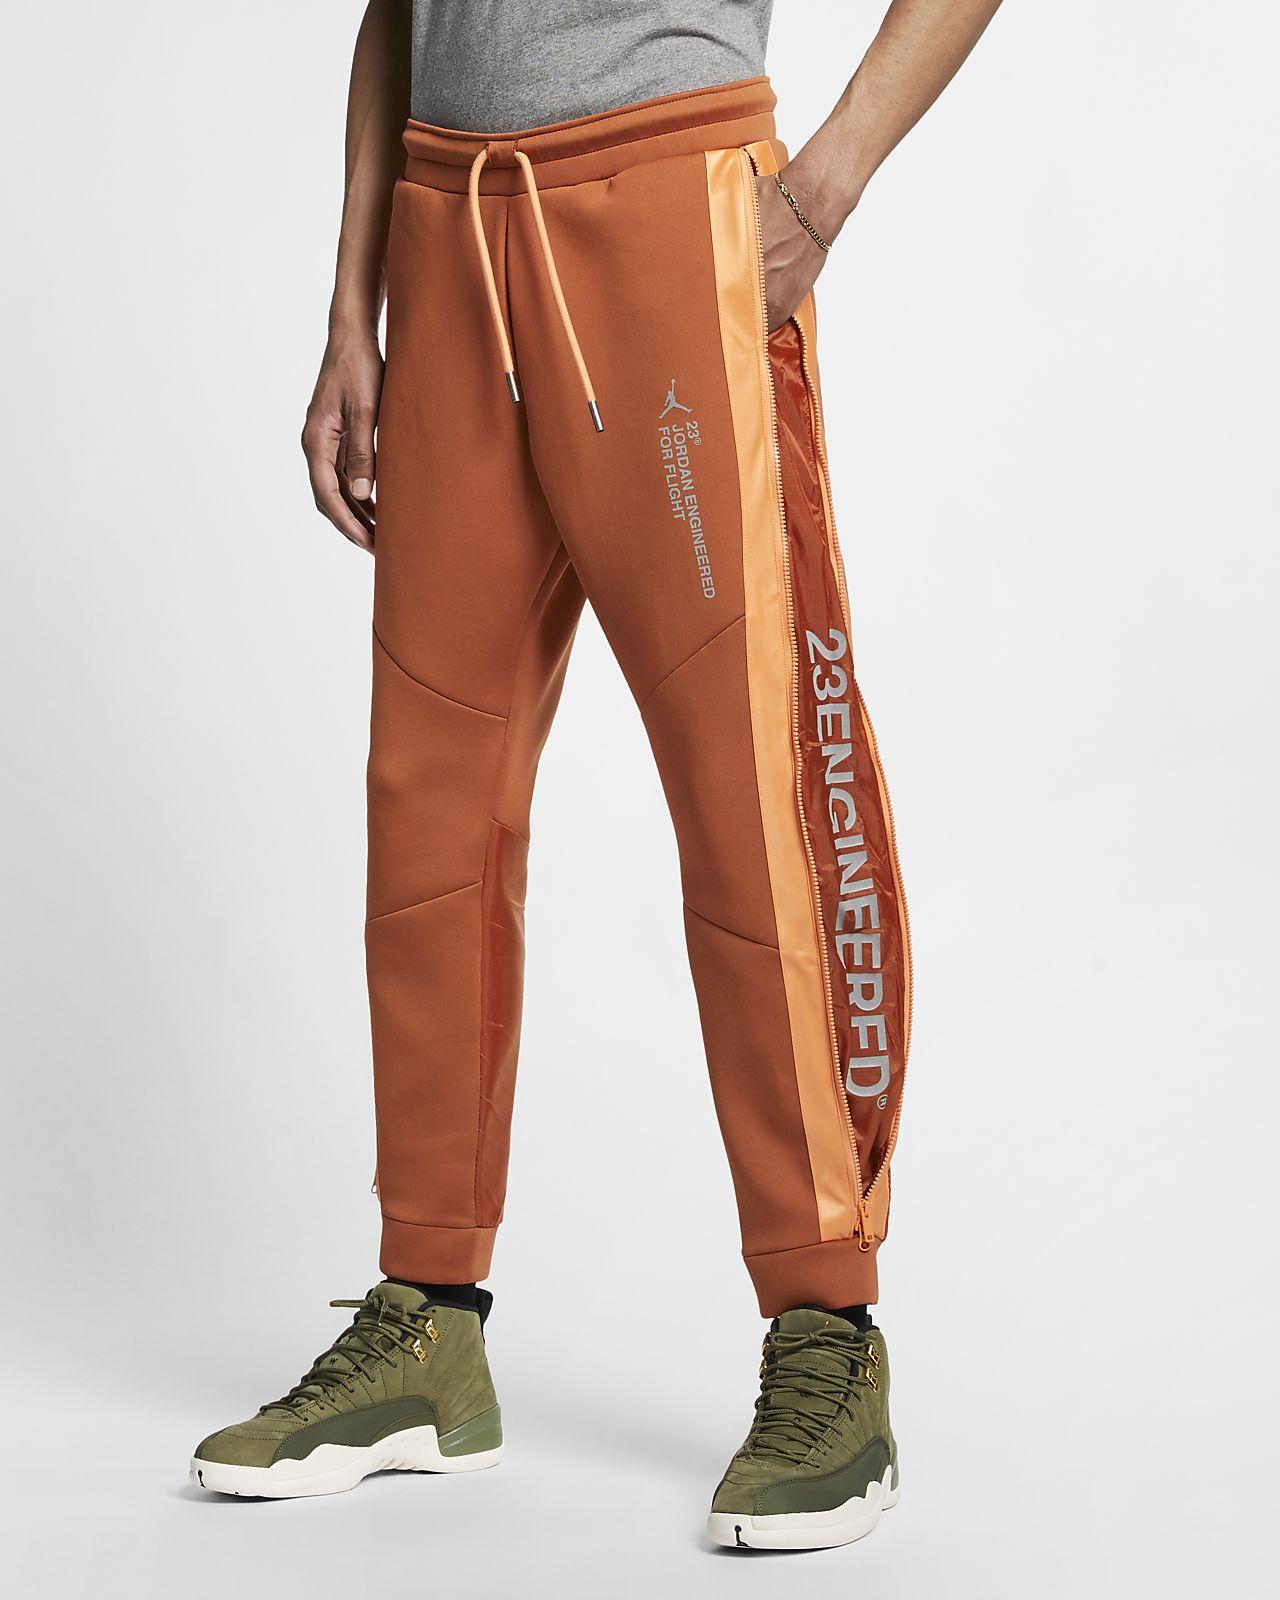 Jordan 23 Engineered Men's Trousers